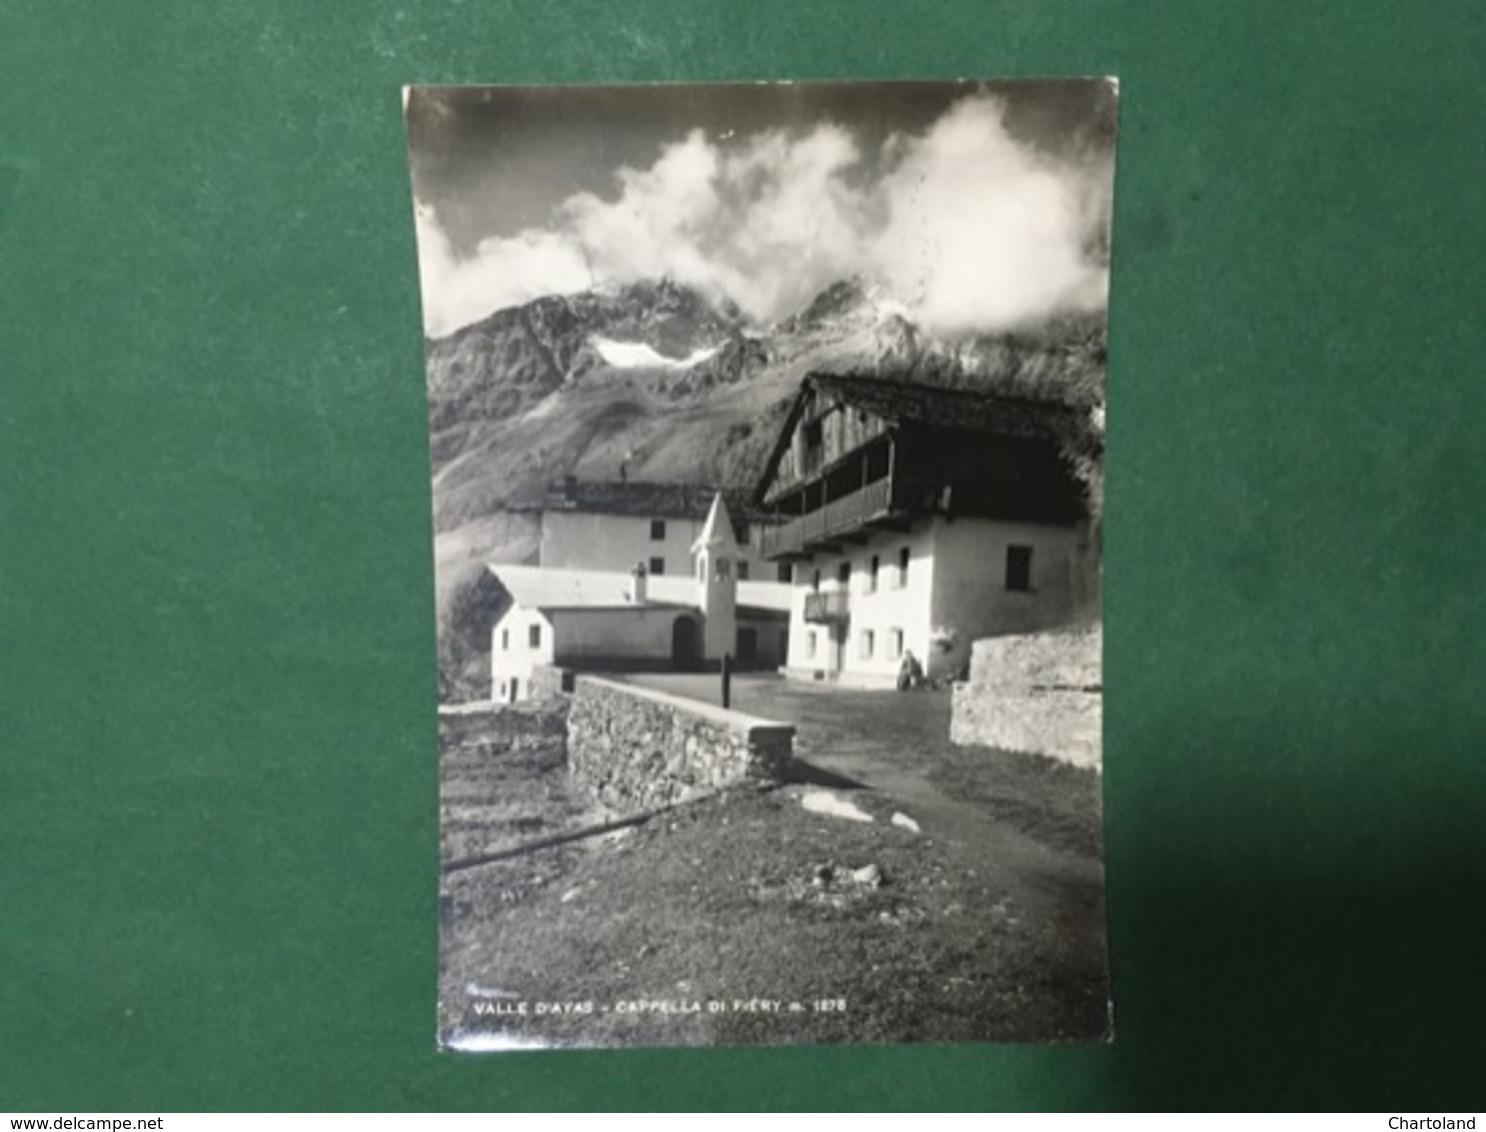 Cartolina La Valle D'Ayas - La Chappelle De Fiery - 1964 - Italy